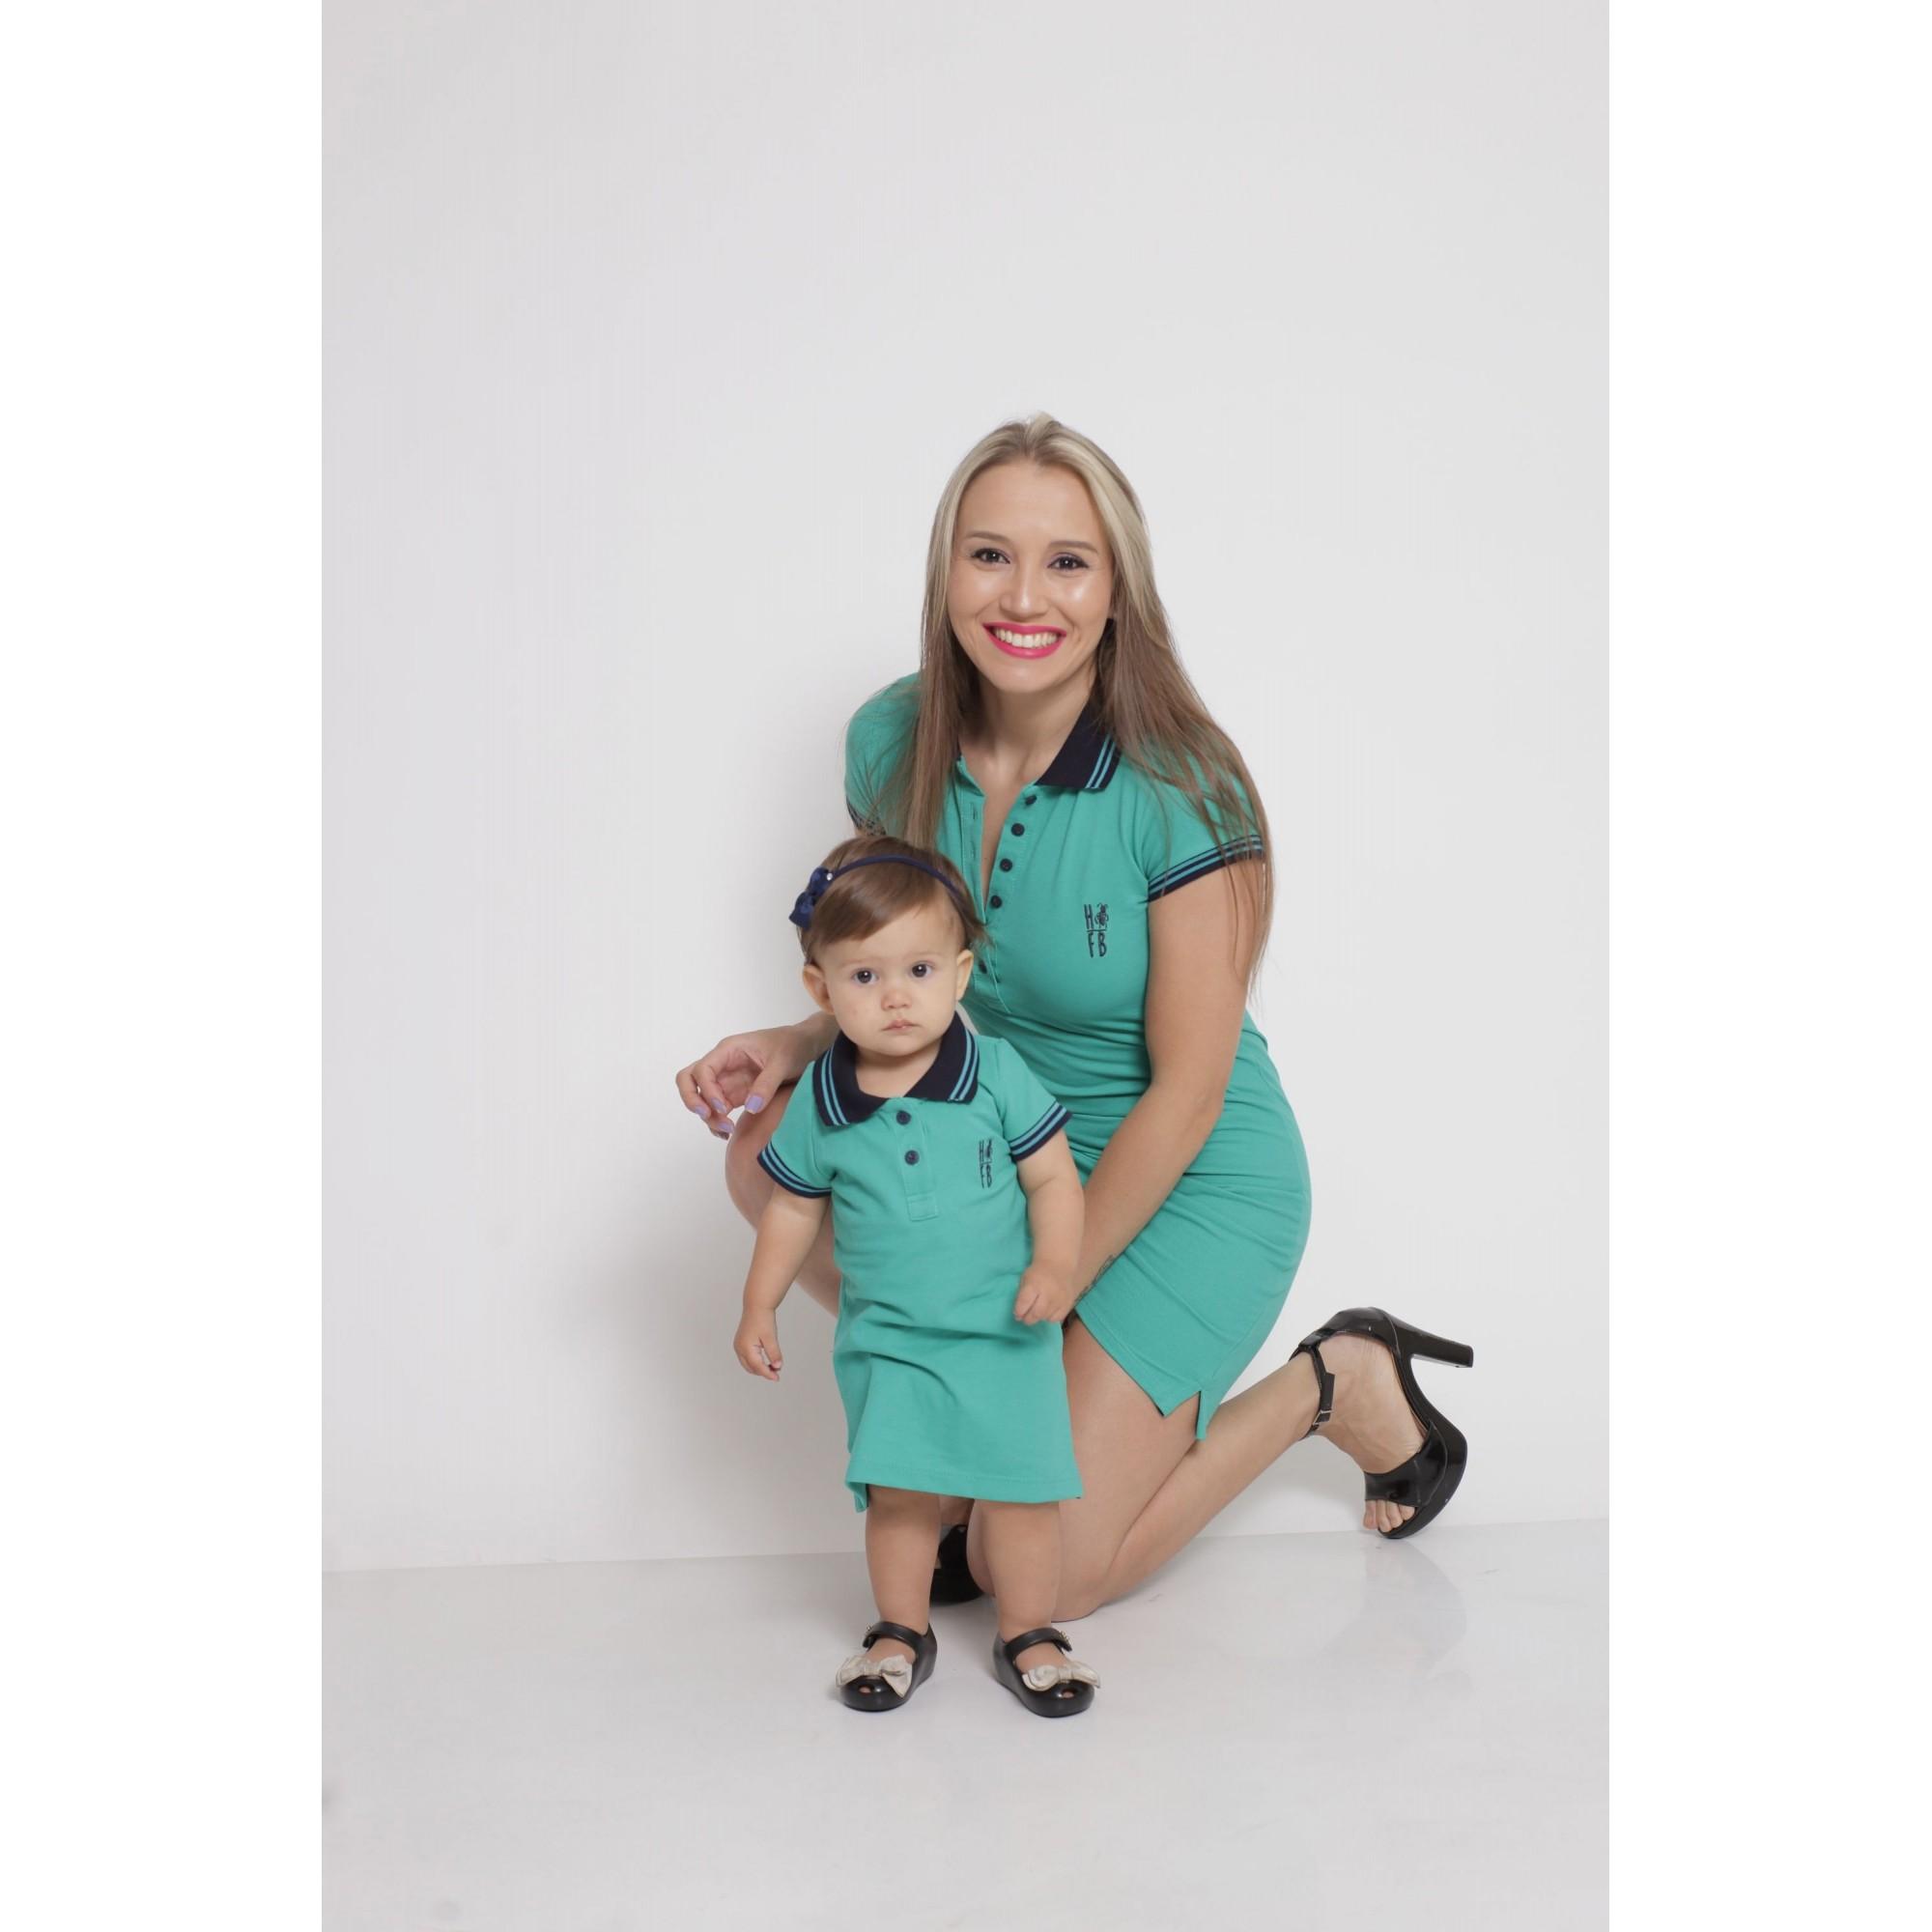 MÃE E FILHA > Kit 02 Vestidos Adulto e Infantil Verde Jade [Coleção Tal Mãe Tal Filha]  - Heitor Fashion Brazil